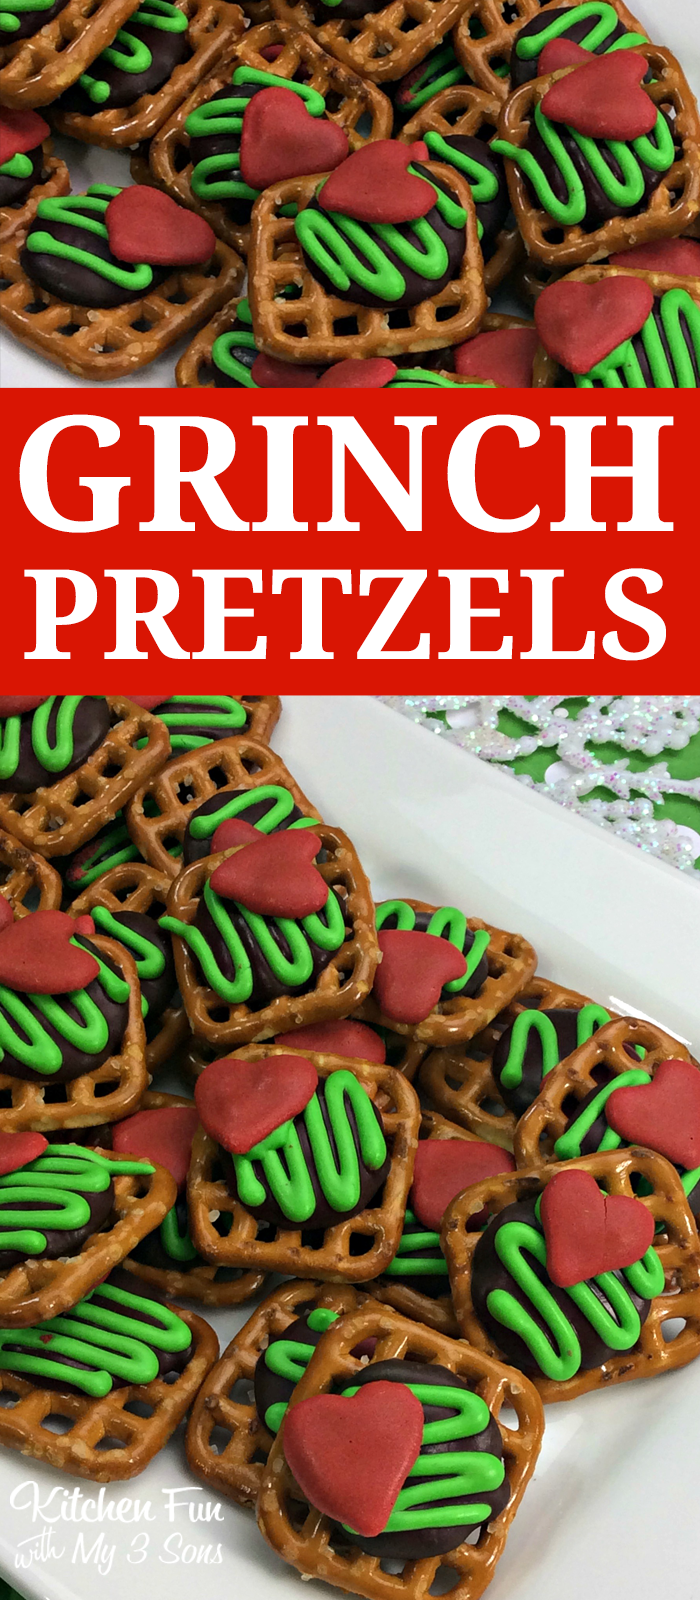 Grinch Pretzels